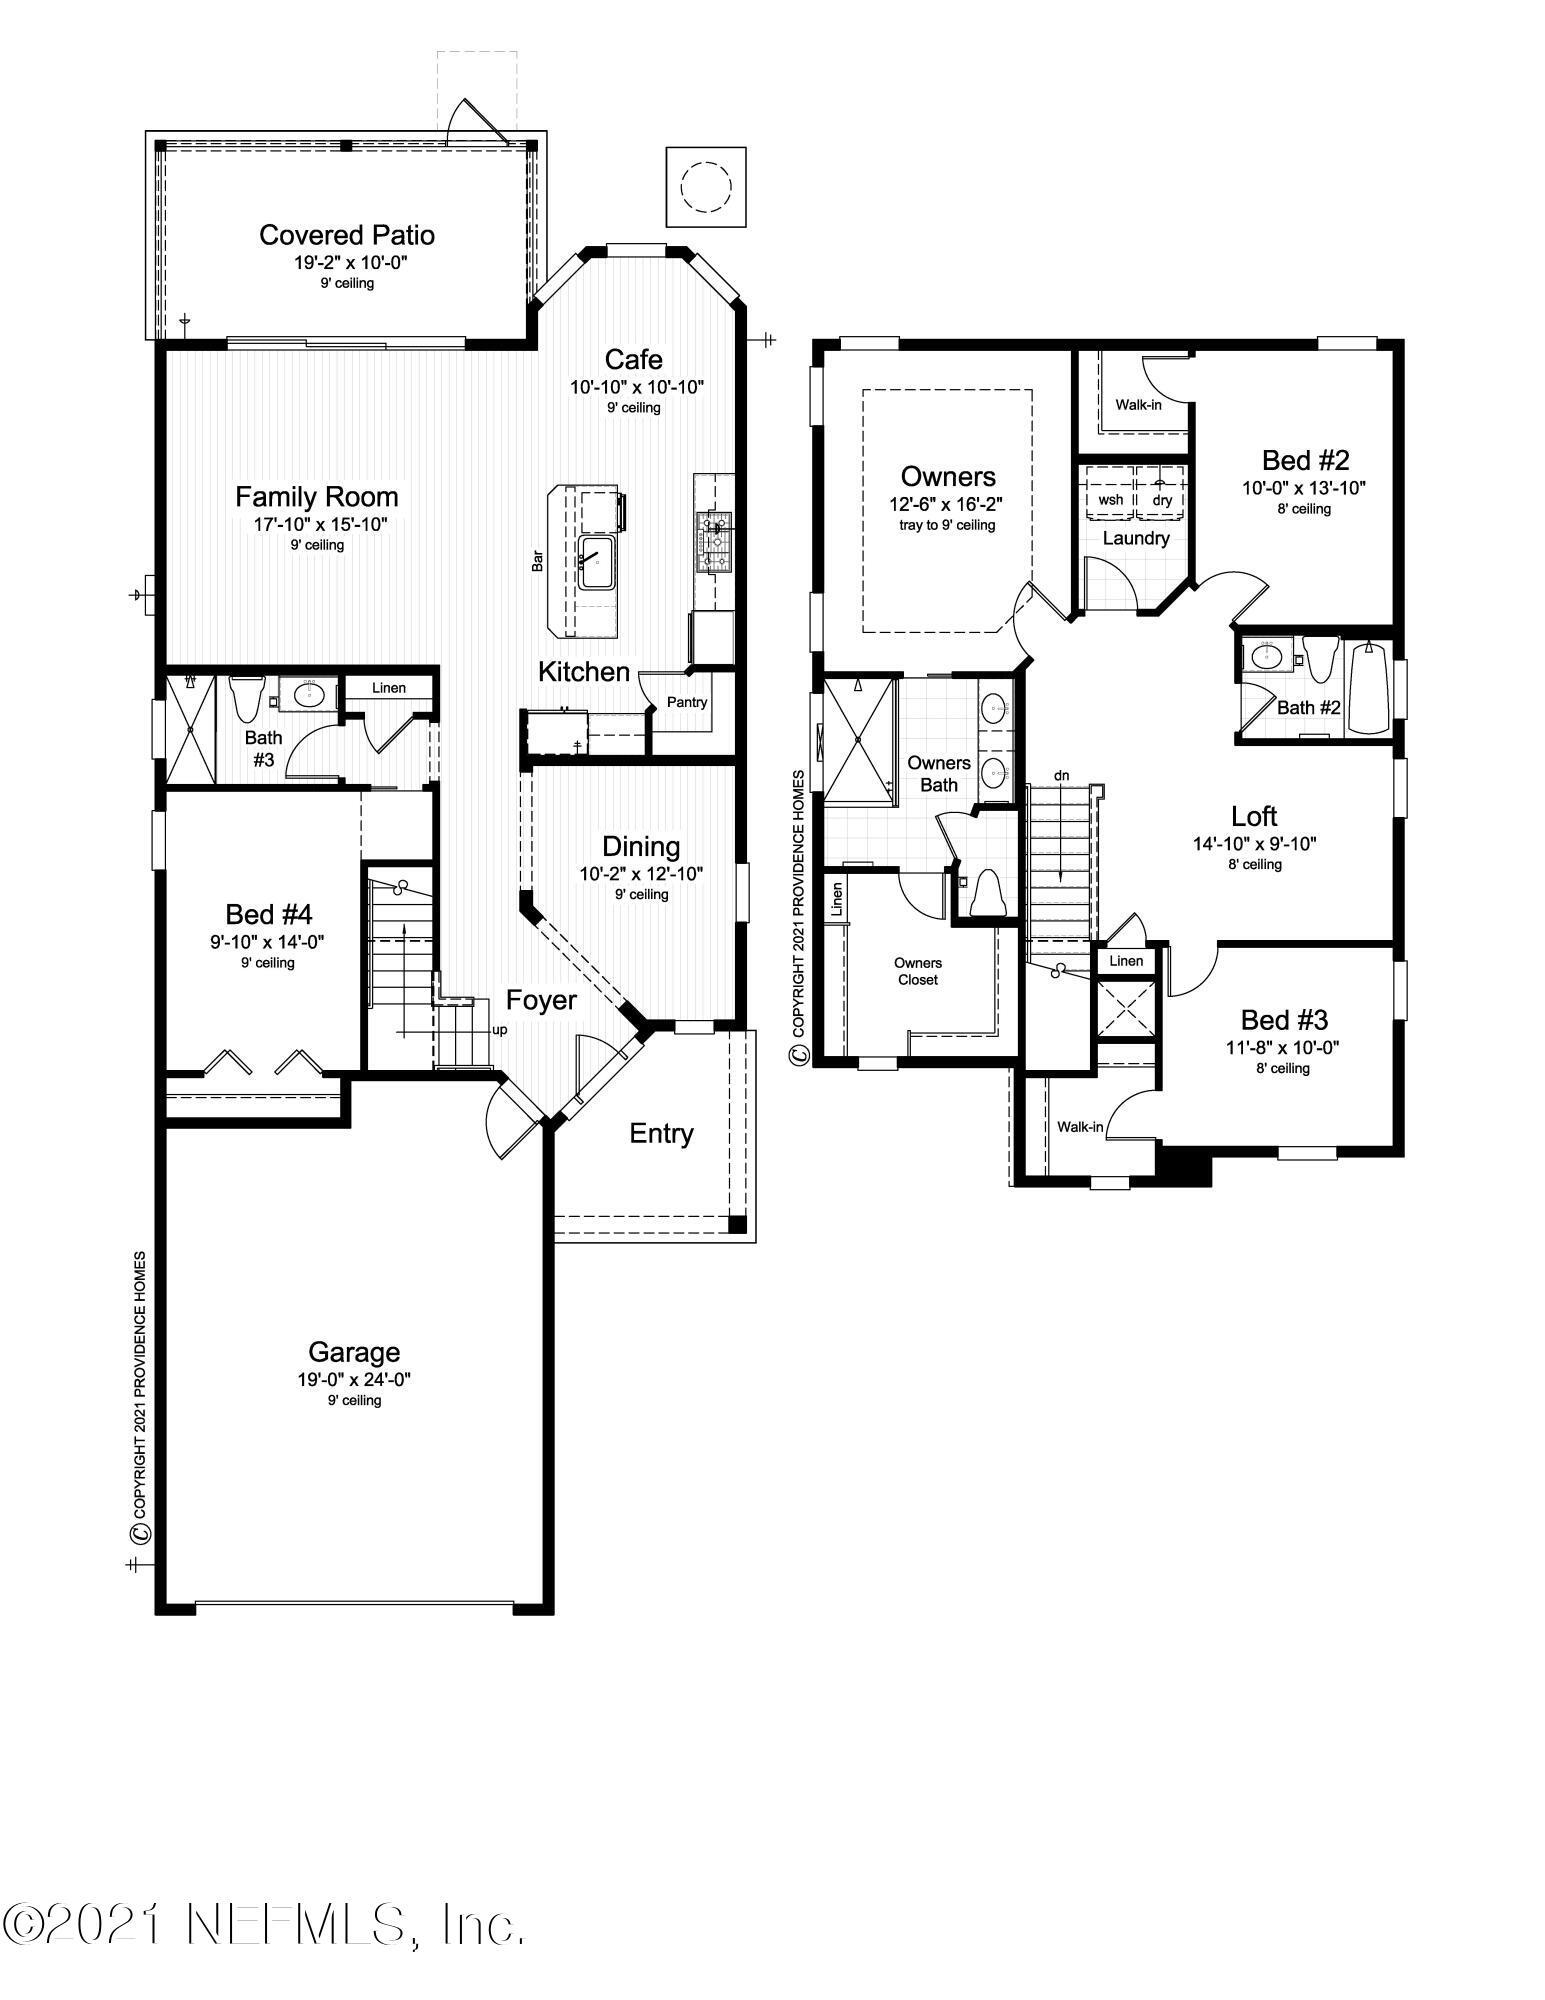 135 ANDESITE, PONTE VEDRA, FLORIDA 32081, 4 Bedrooms Bedrooms, ,3 BathroomsBathrooms,Residential,For sale,ANDESITE,1115656